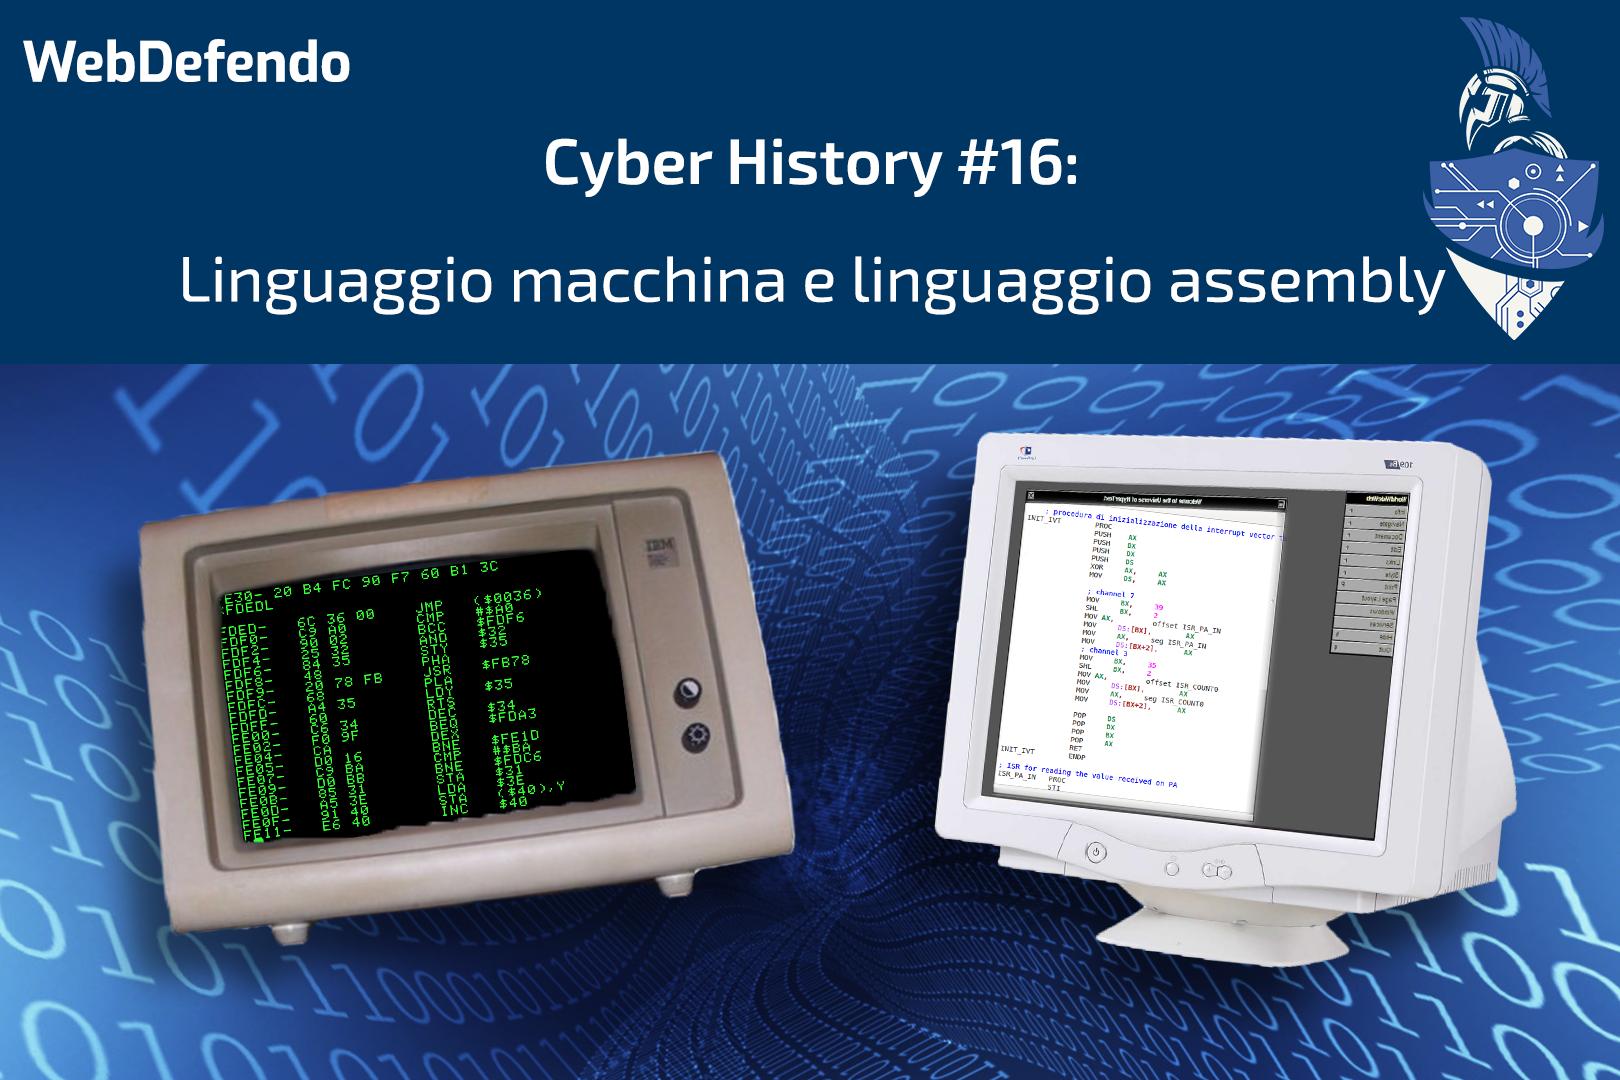 CyberHistory #16: Linguaggio macchina e linguaggio assembly